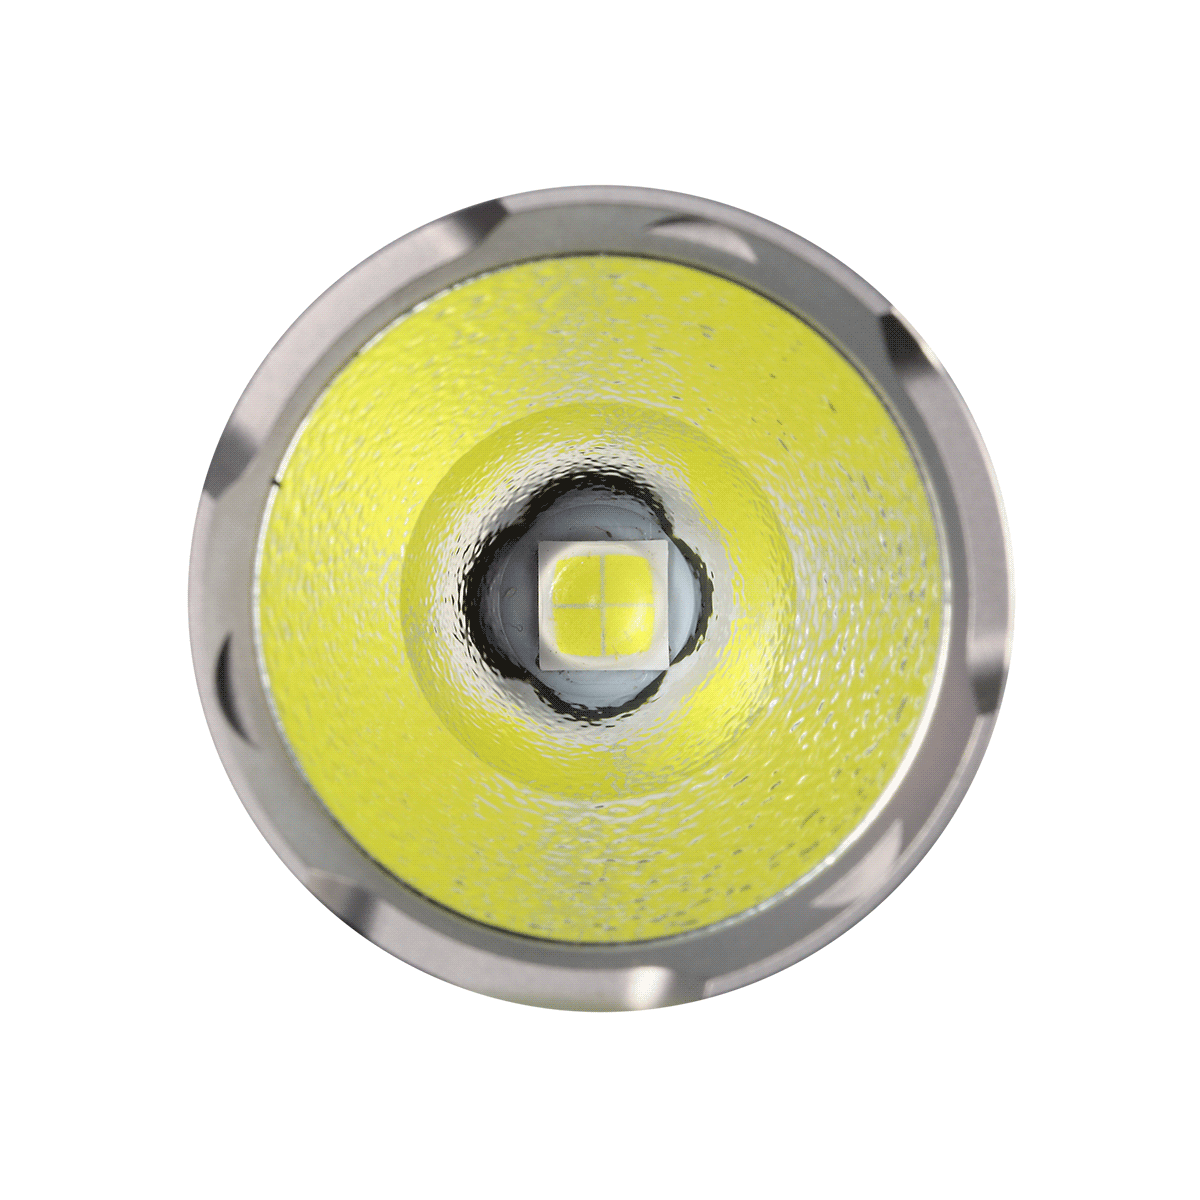 Nitecore TM03 Torch Outdoor lamp LED light 2800 Lumens 4 Brightness levels Ti